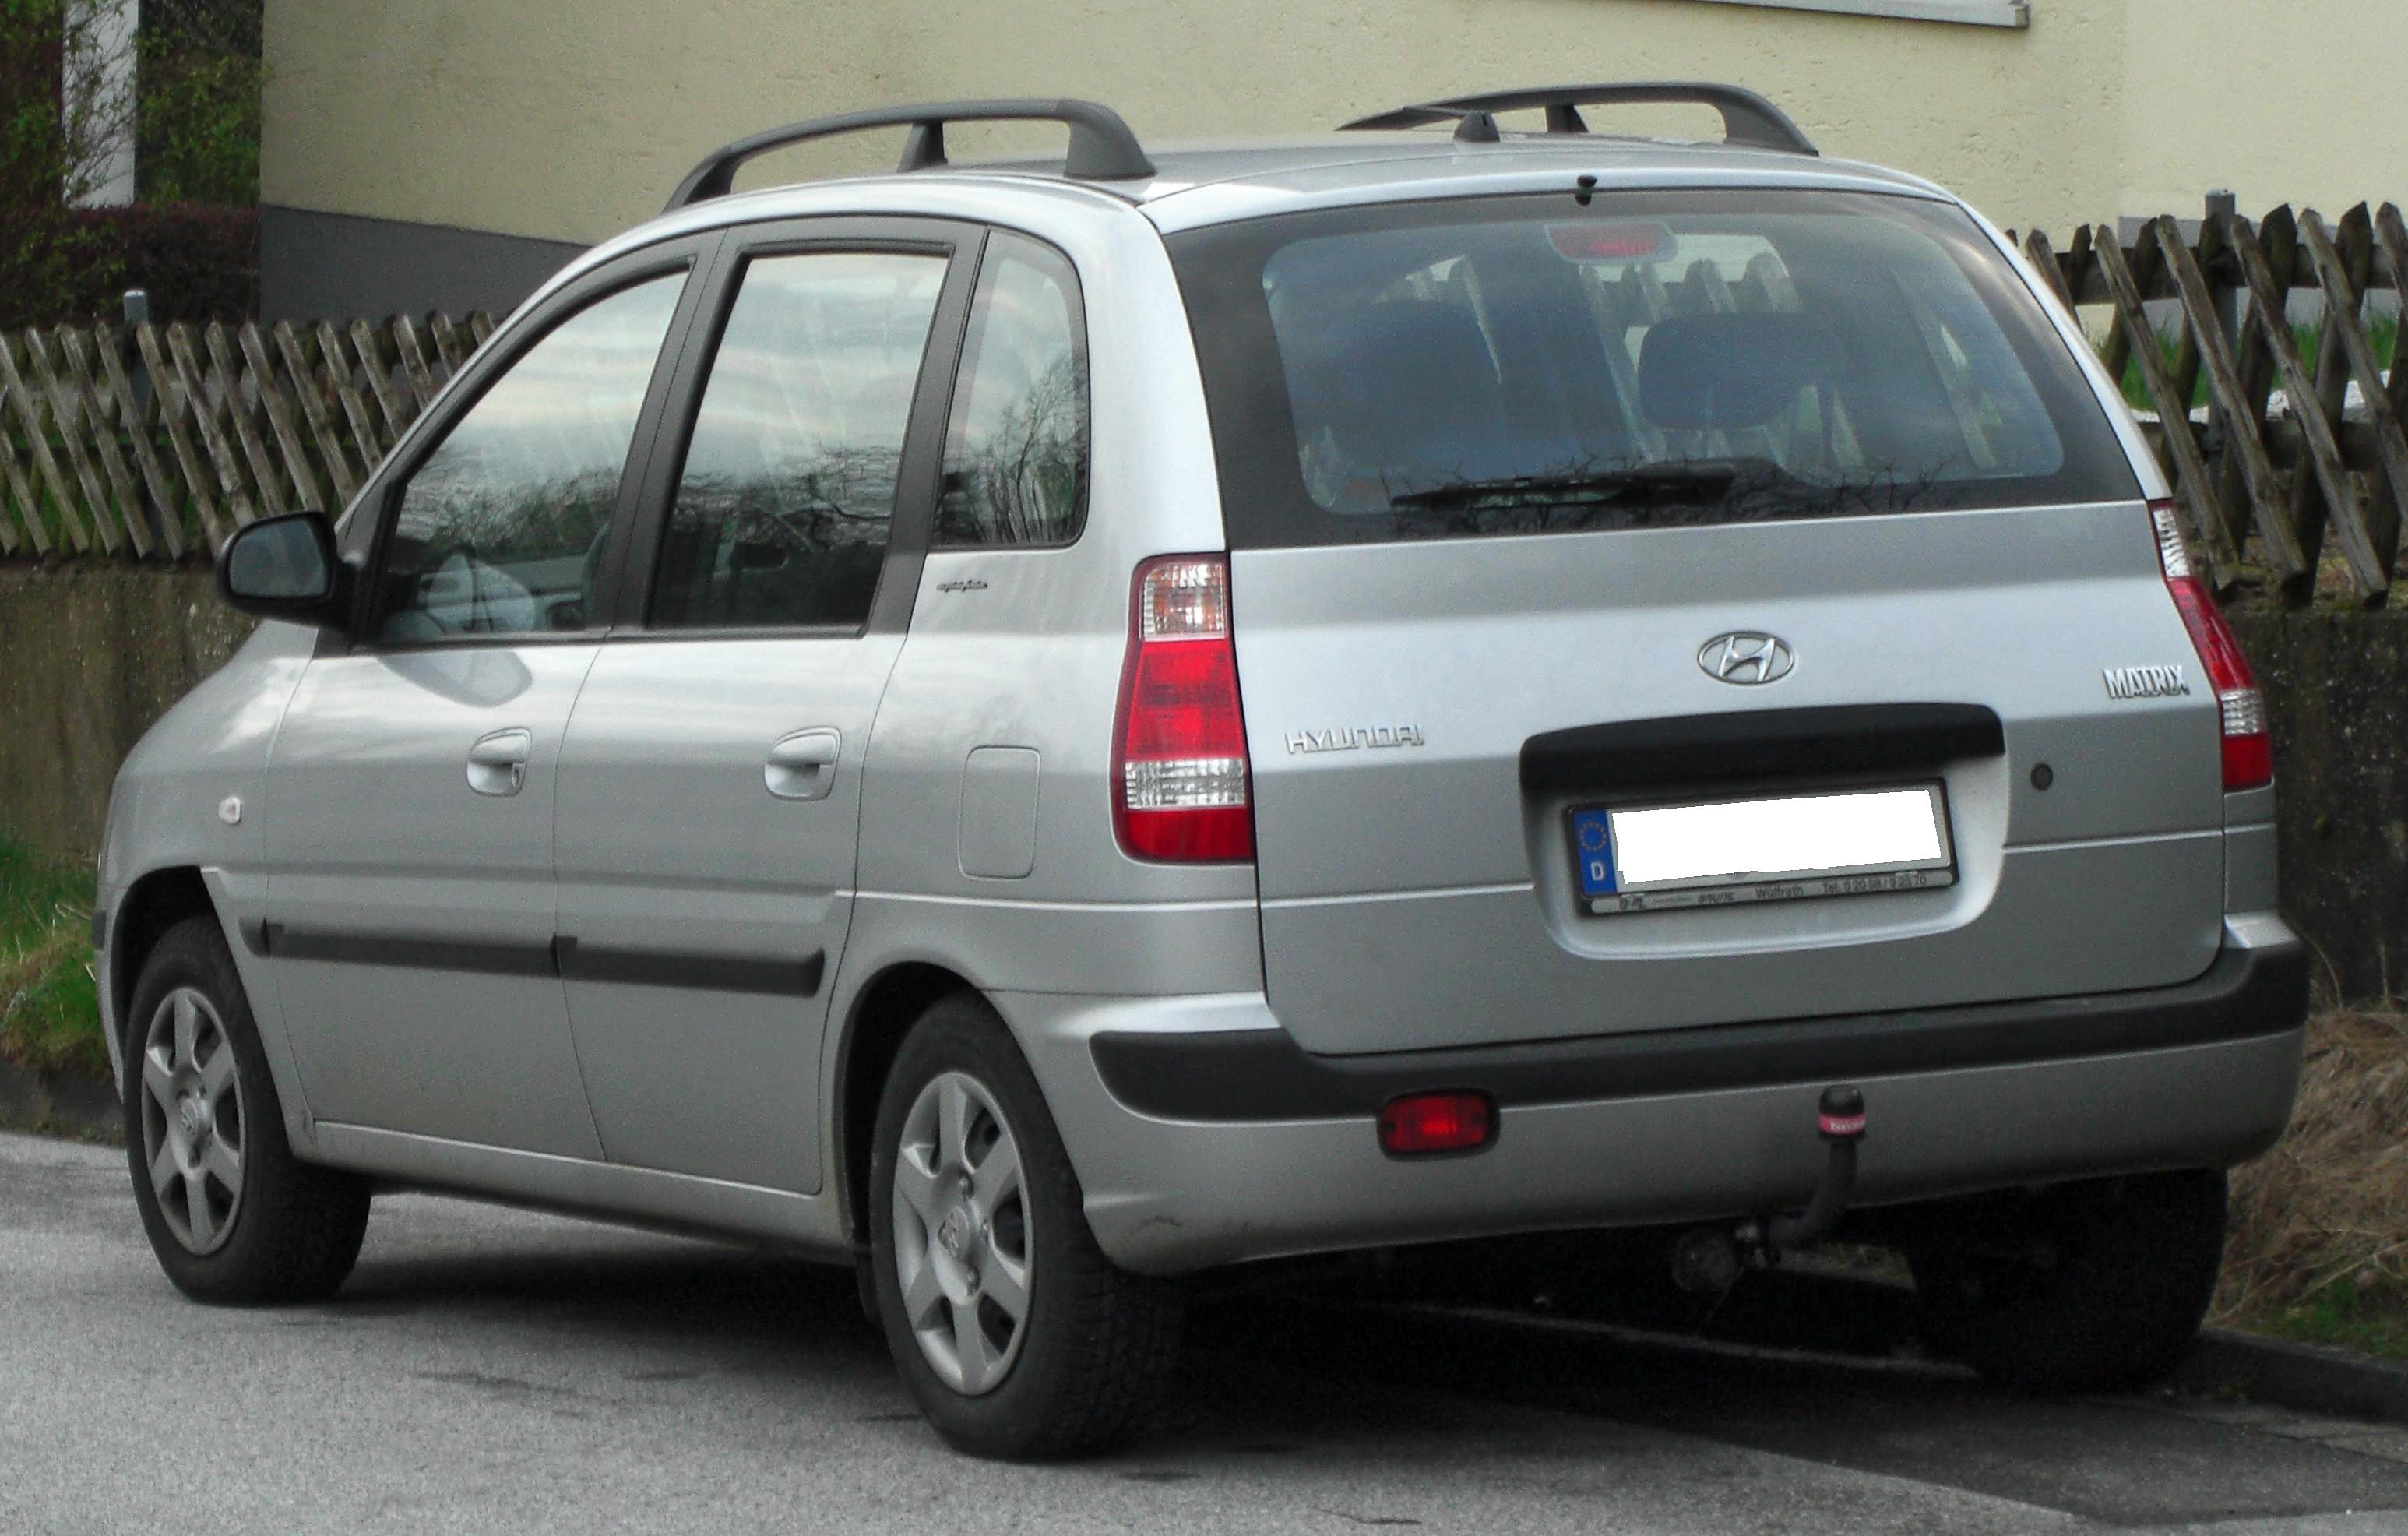 File:Hyundai Matrix Facelift rear jpg - Wikimedia Commons